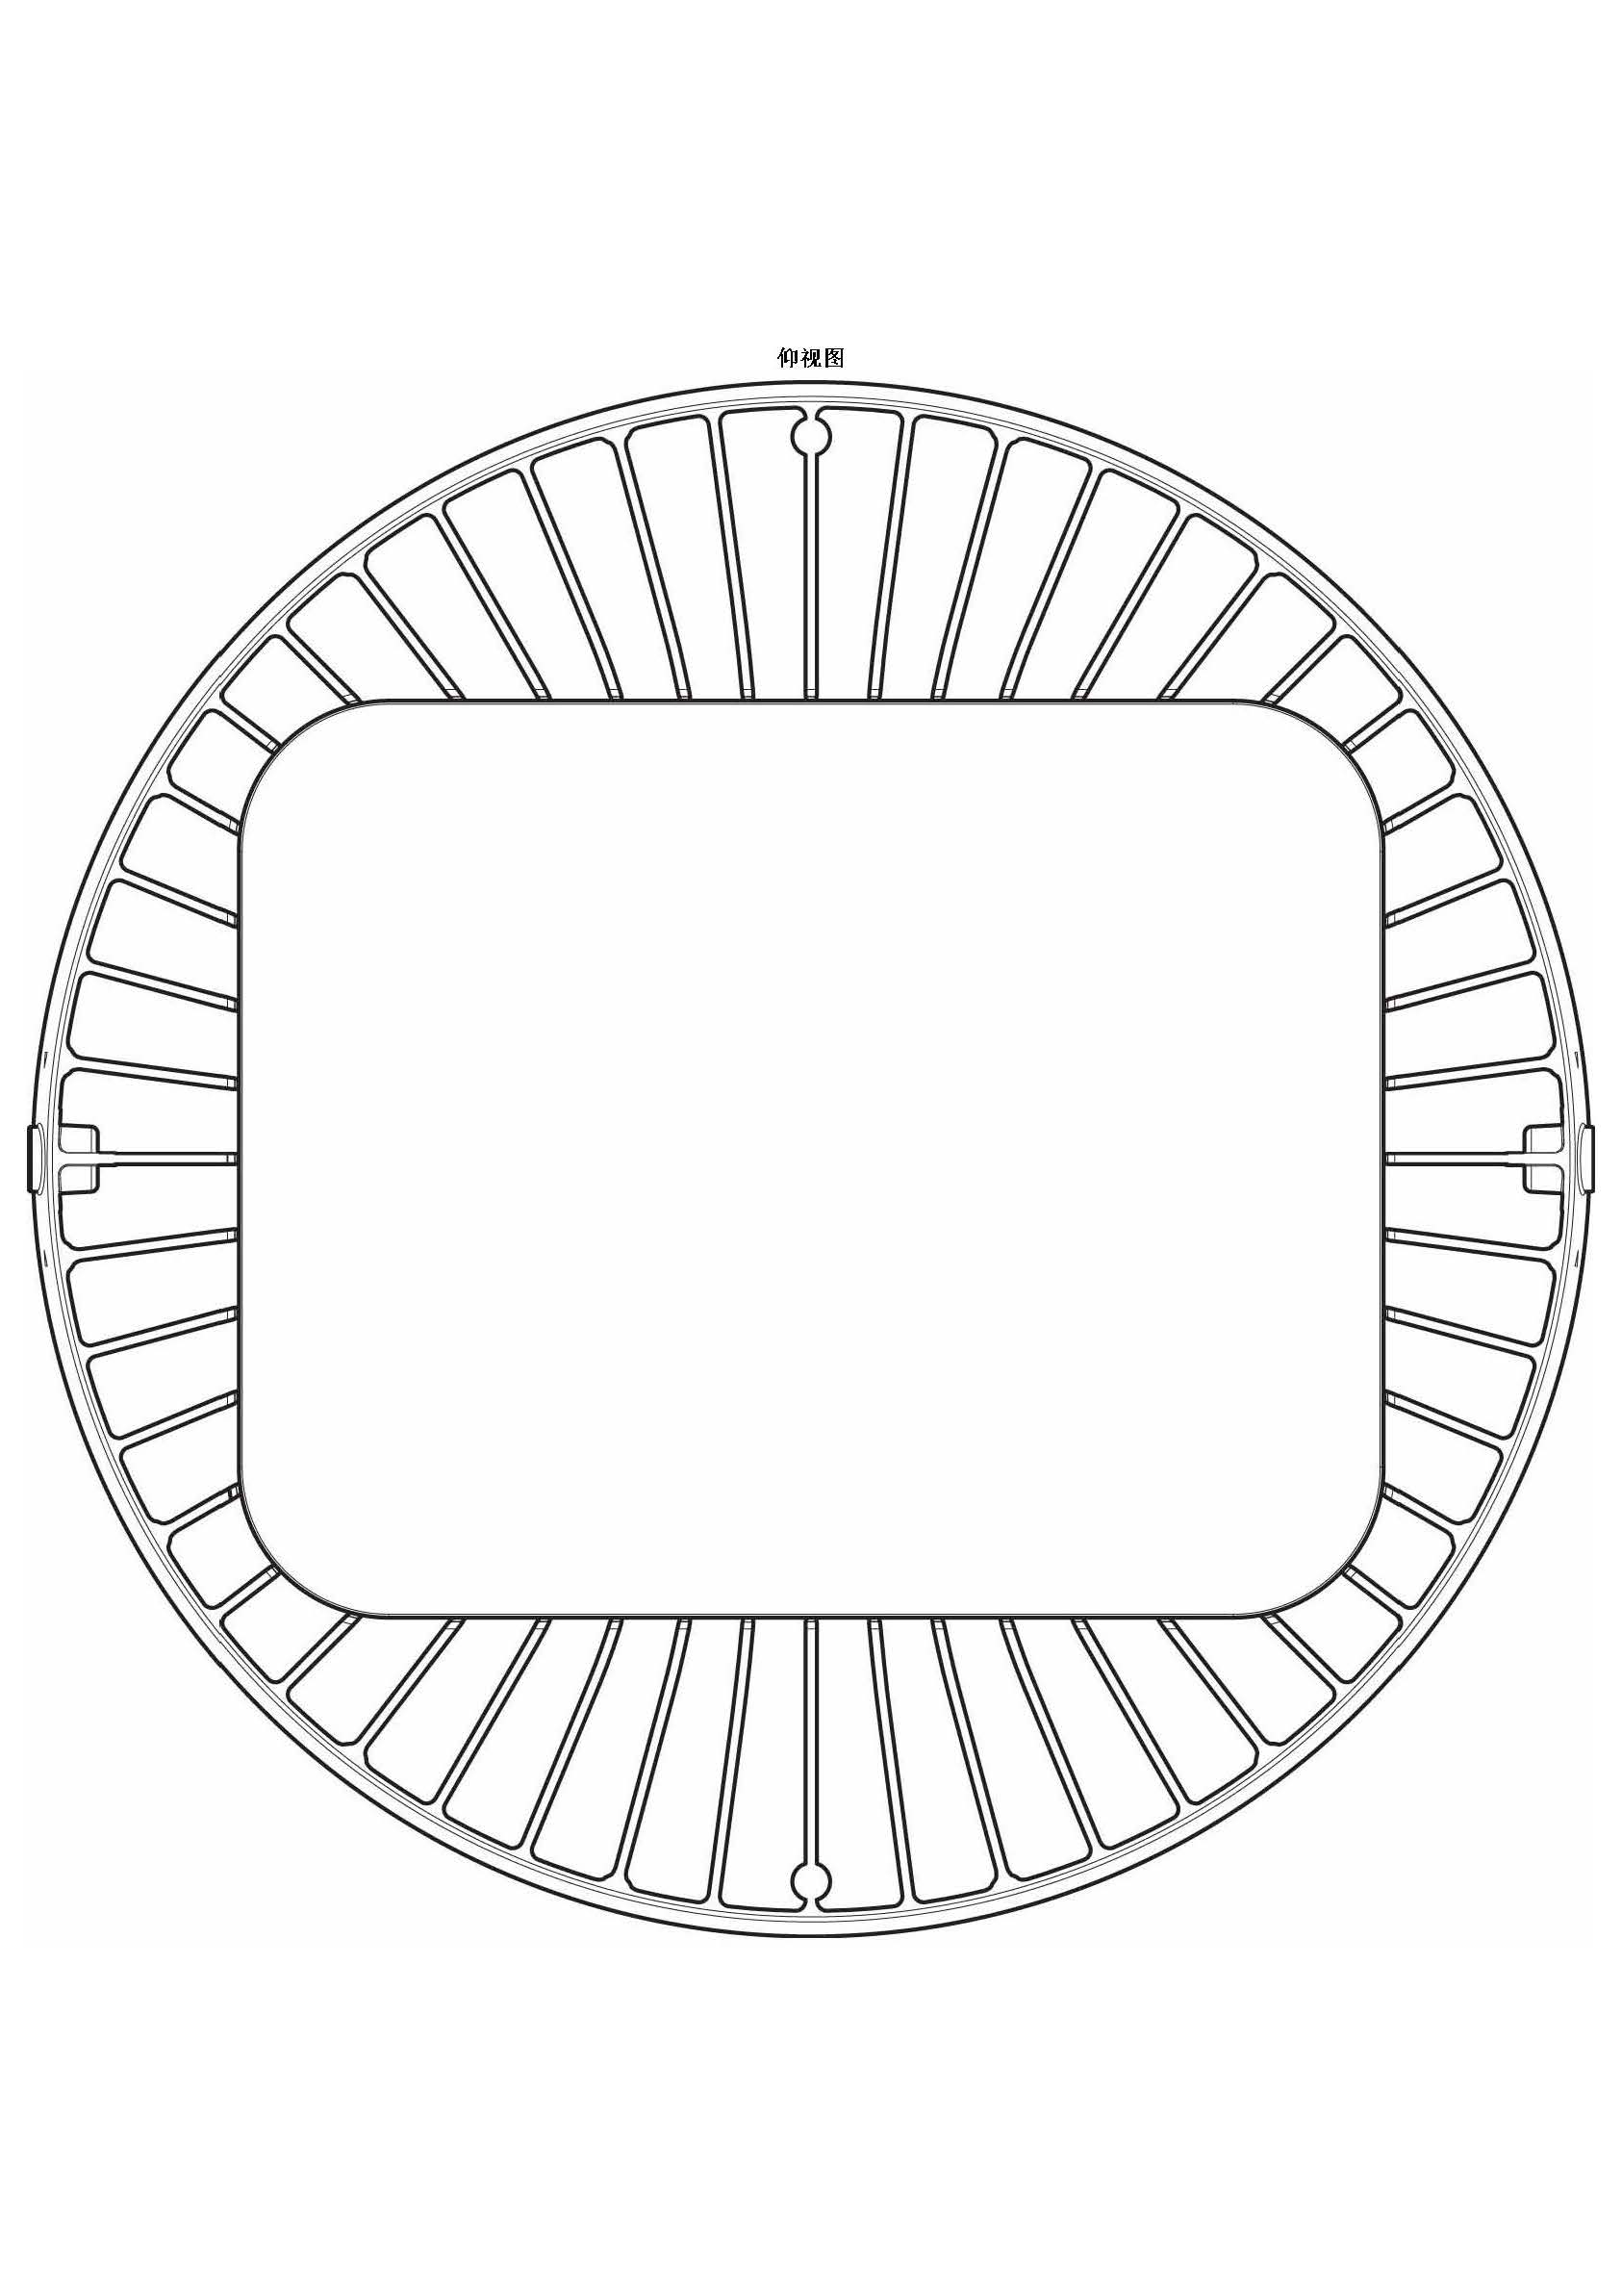 CN201630209928-LED高天棚燈-外觀專利_頁面_8.jpg